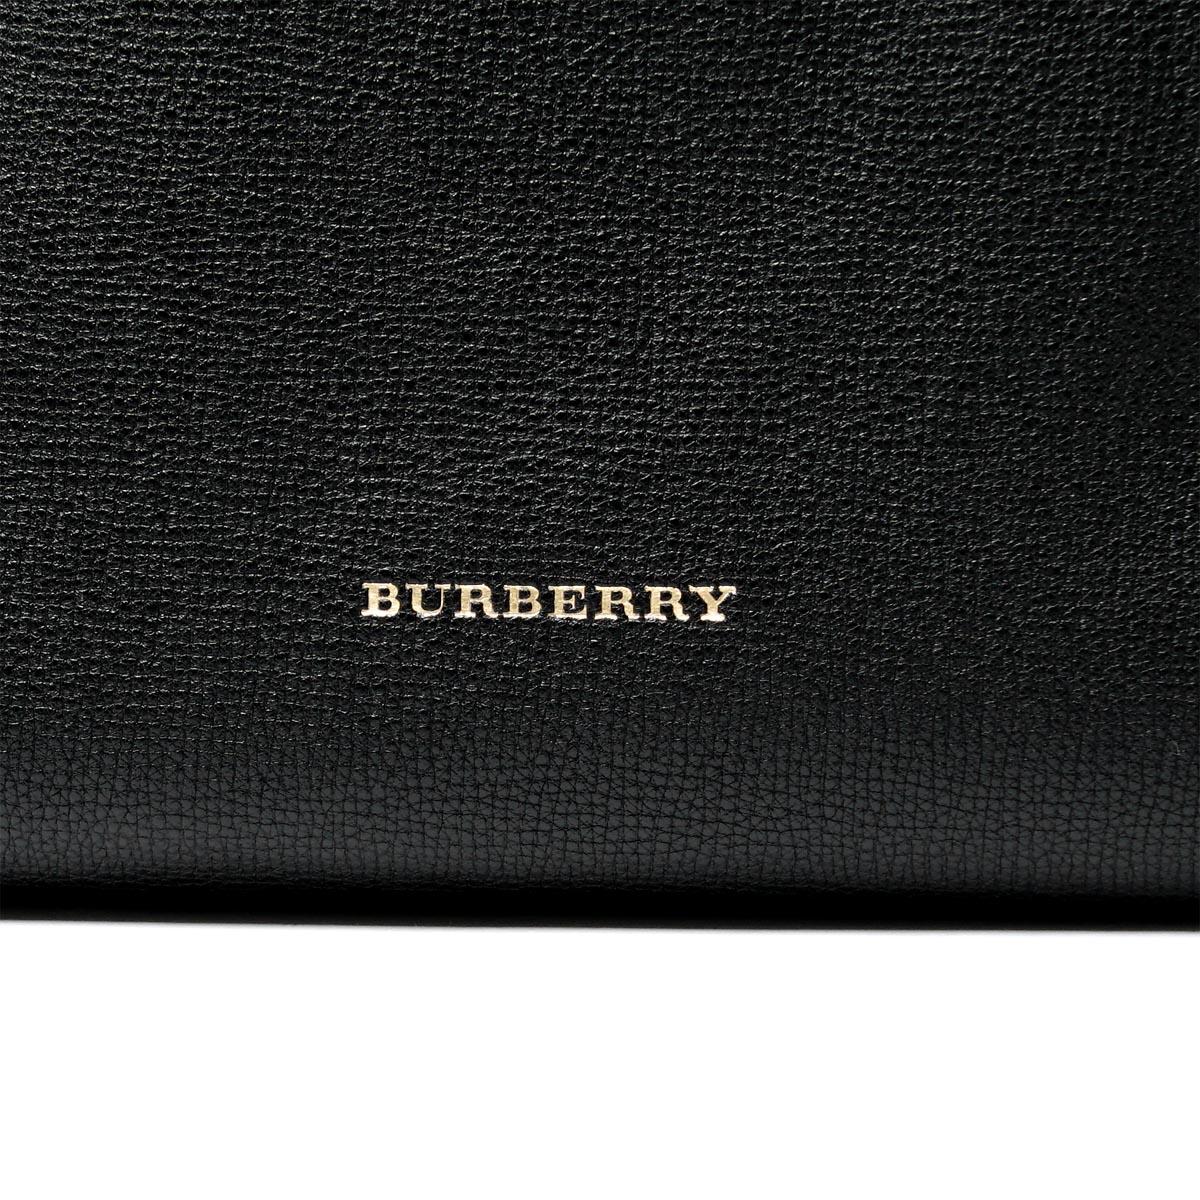 博柏利BURBERRY大手提包HOUSE CHECK DERBY SMALL CANTER BLACK黑色派3958975 black女士